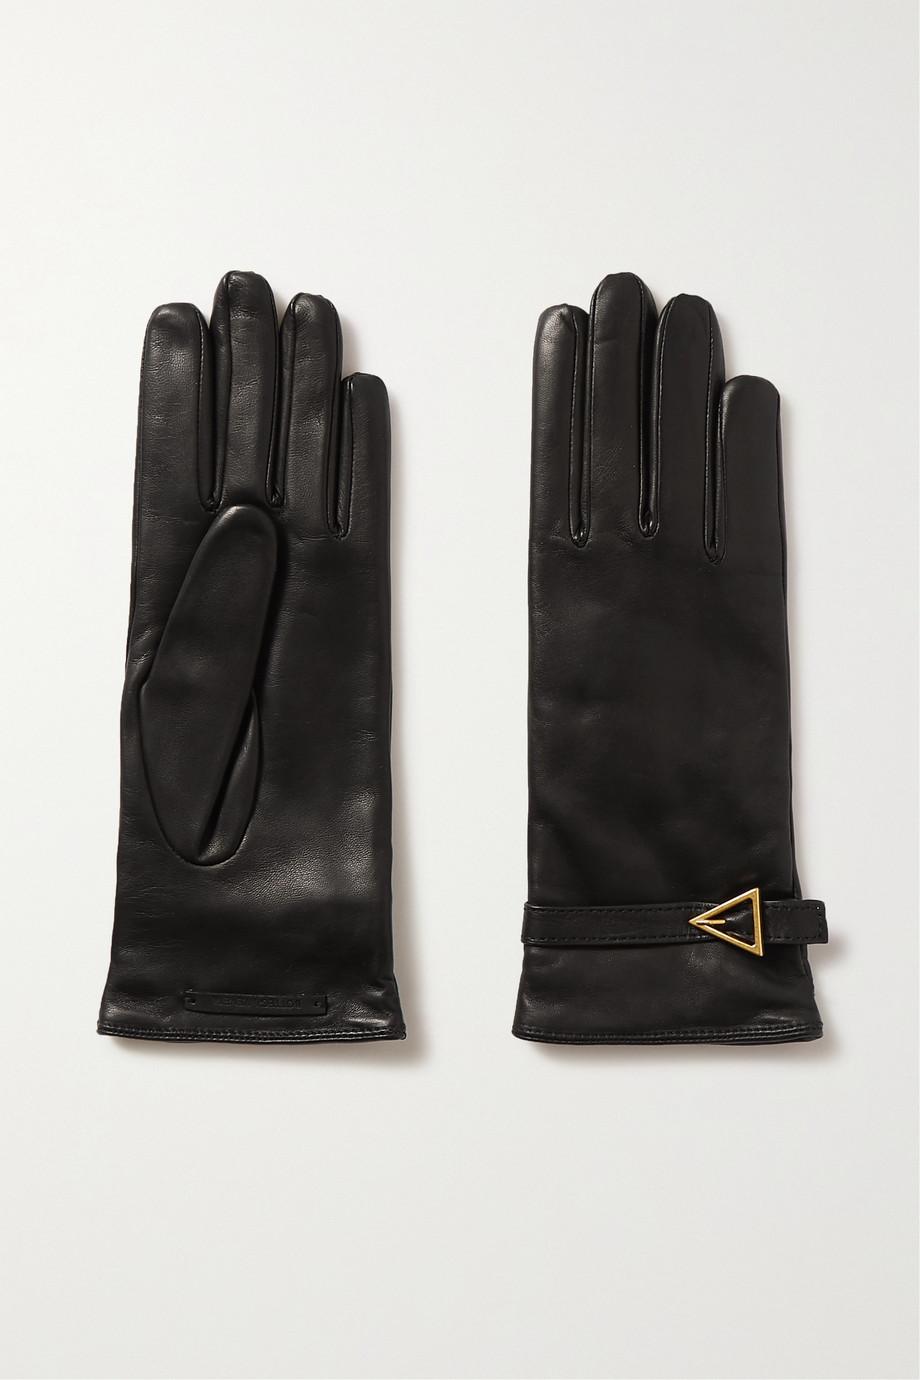 Bottega Veneta Handschuhe aus Leder mit Verzierung